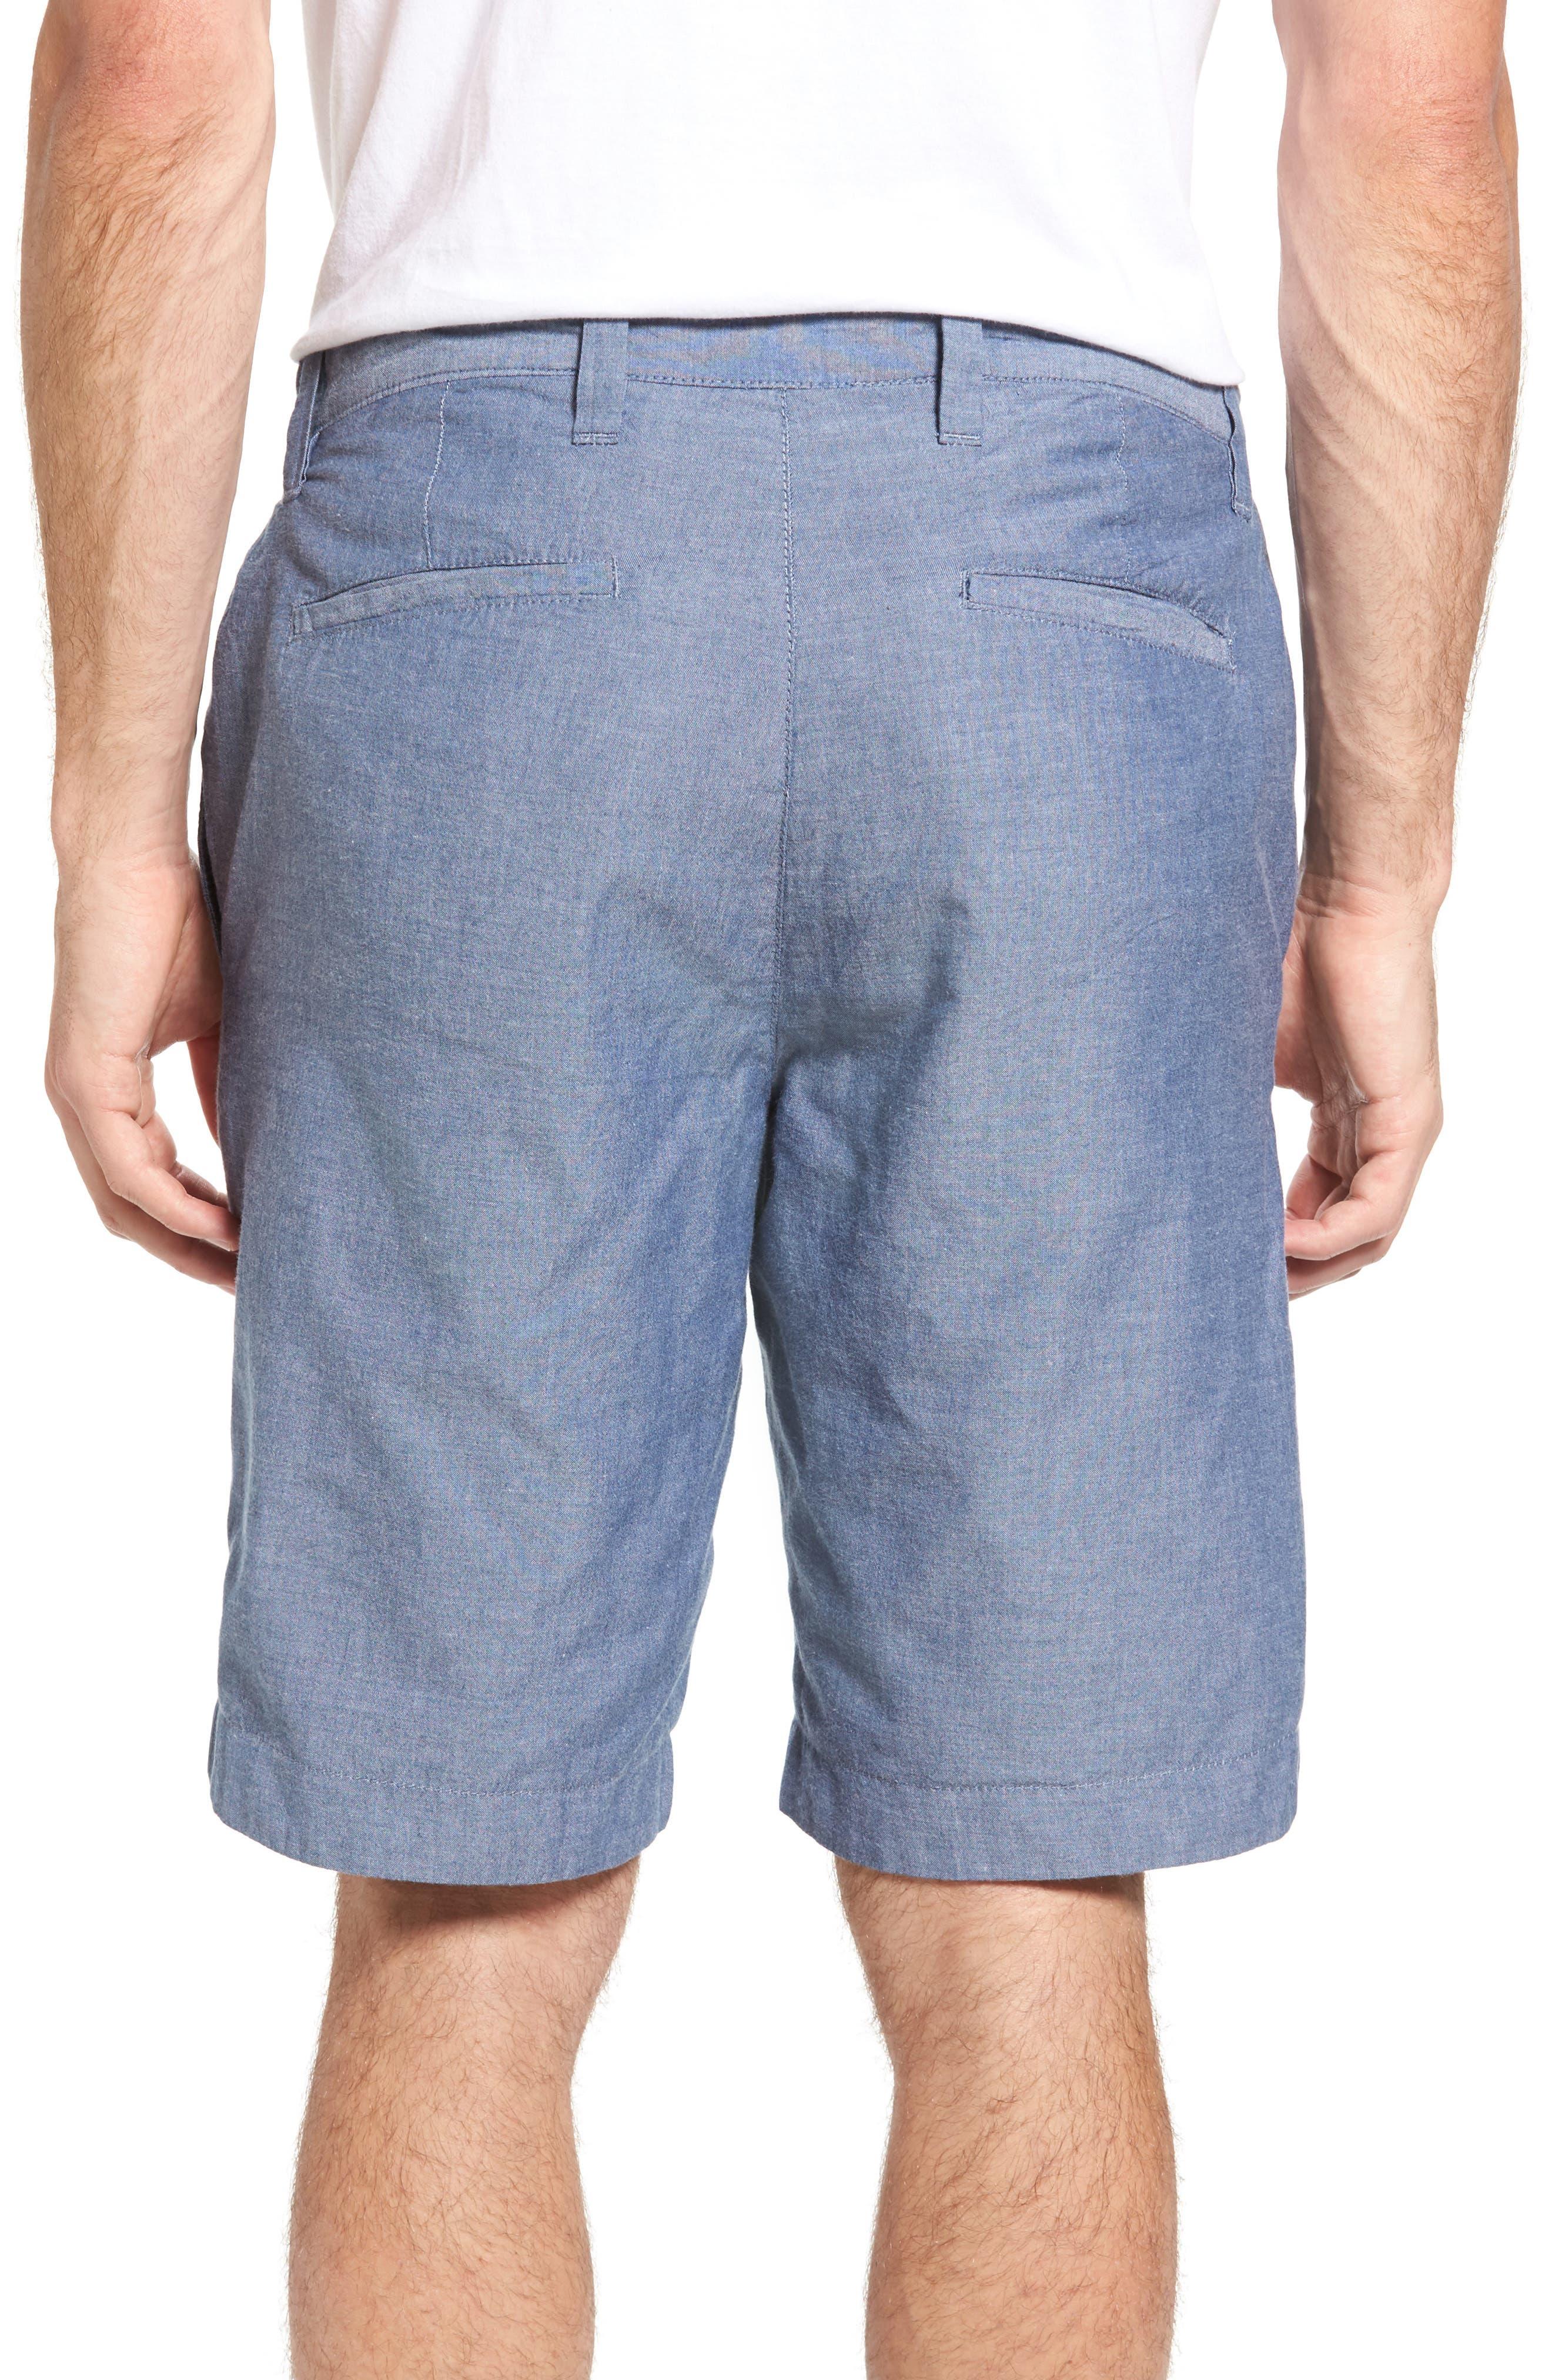 Reversible Walking Shorts,                             Alternate thumbnail 2, color,                             404